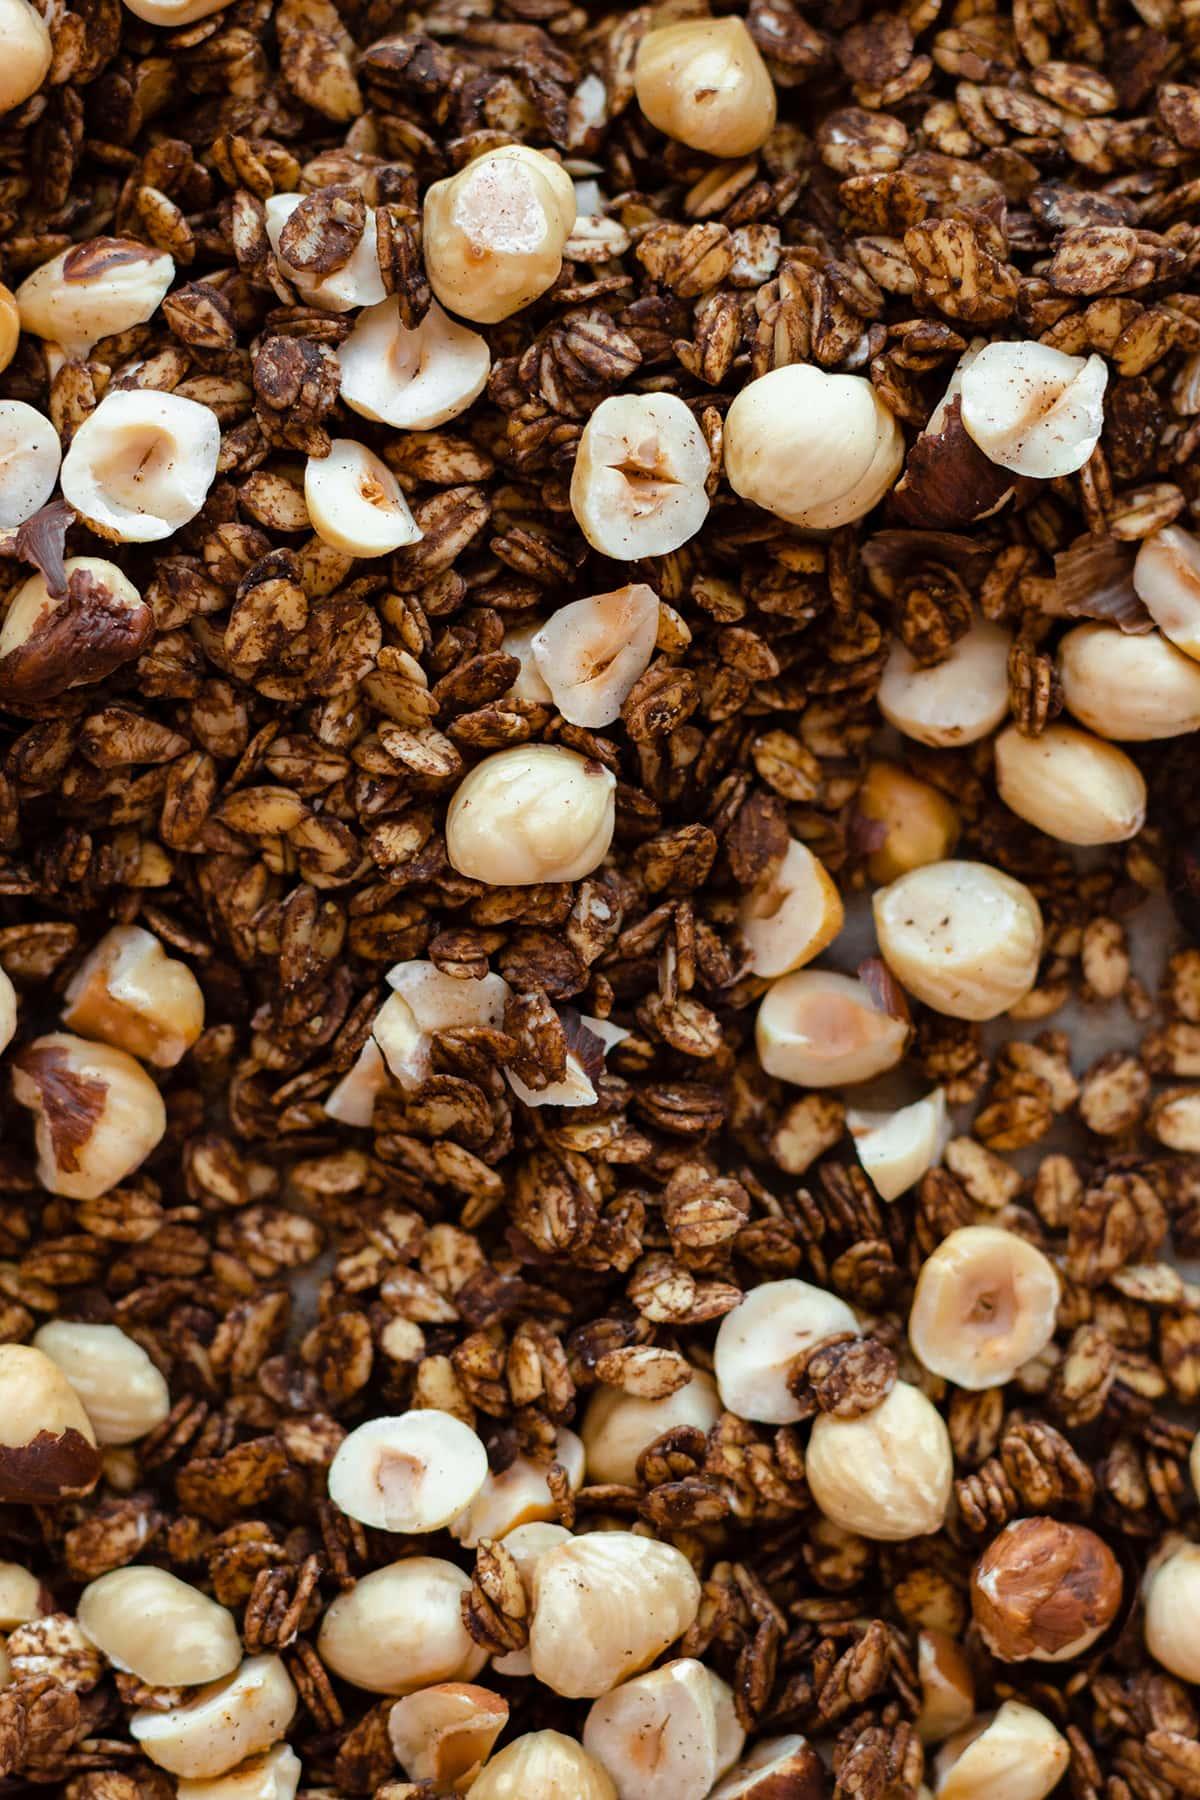 Roasted Hazelnut Carob Granola on a baking sheet - a close up photo.